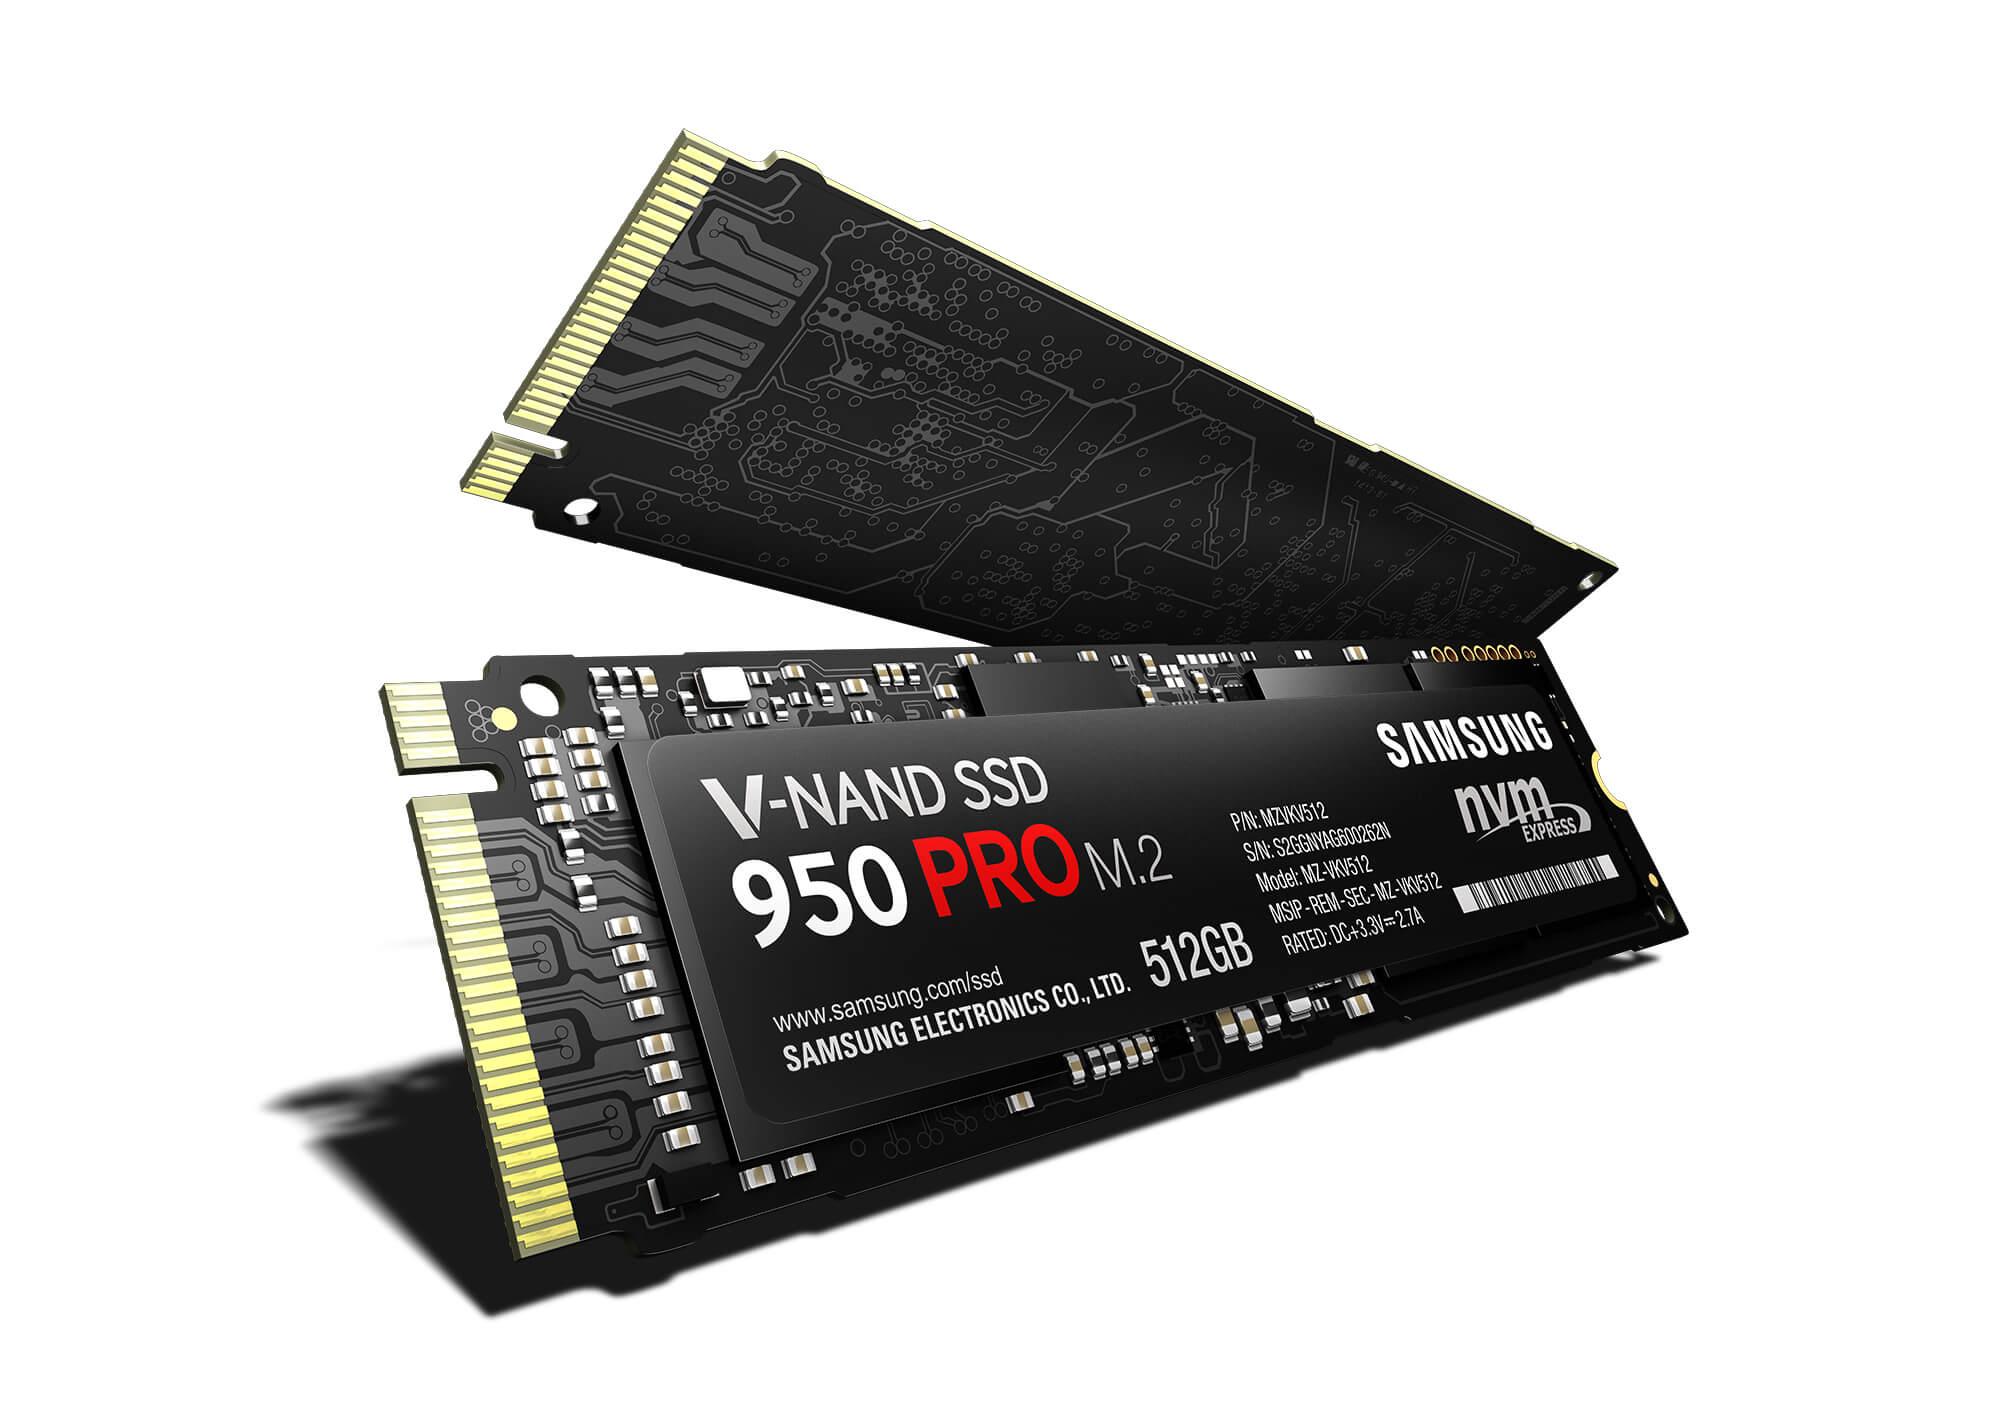 950 Pro